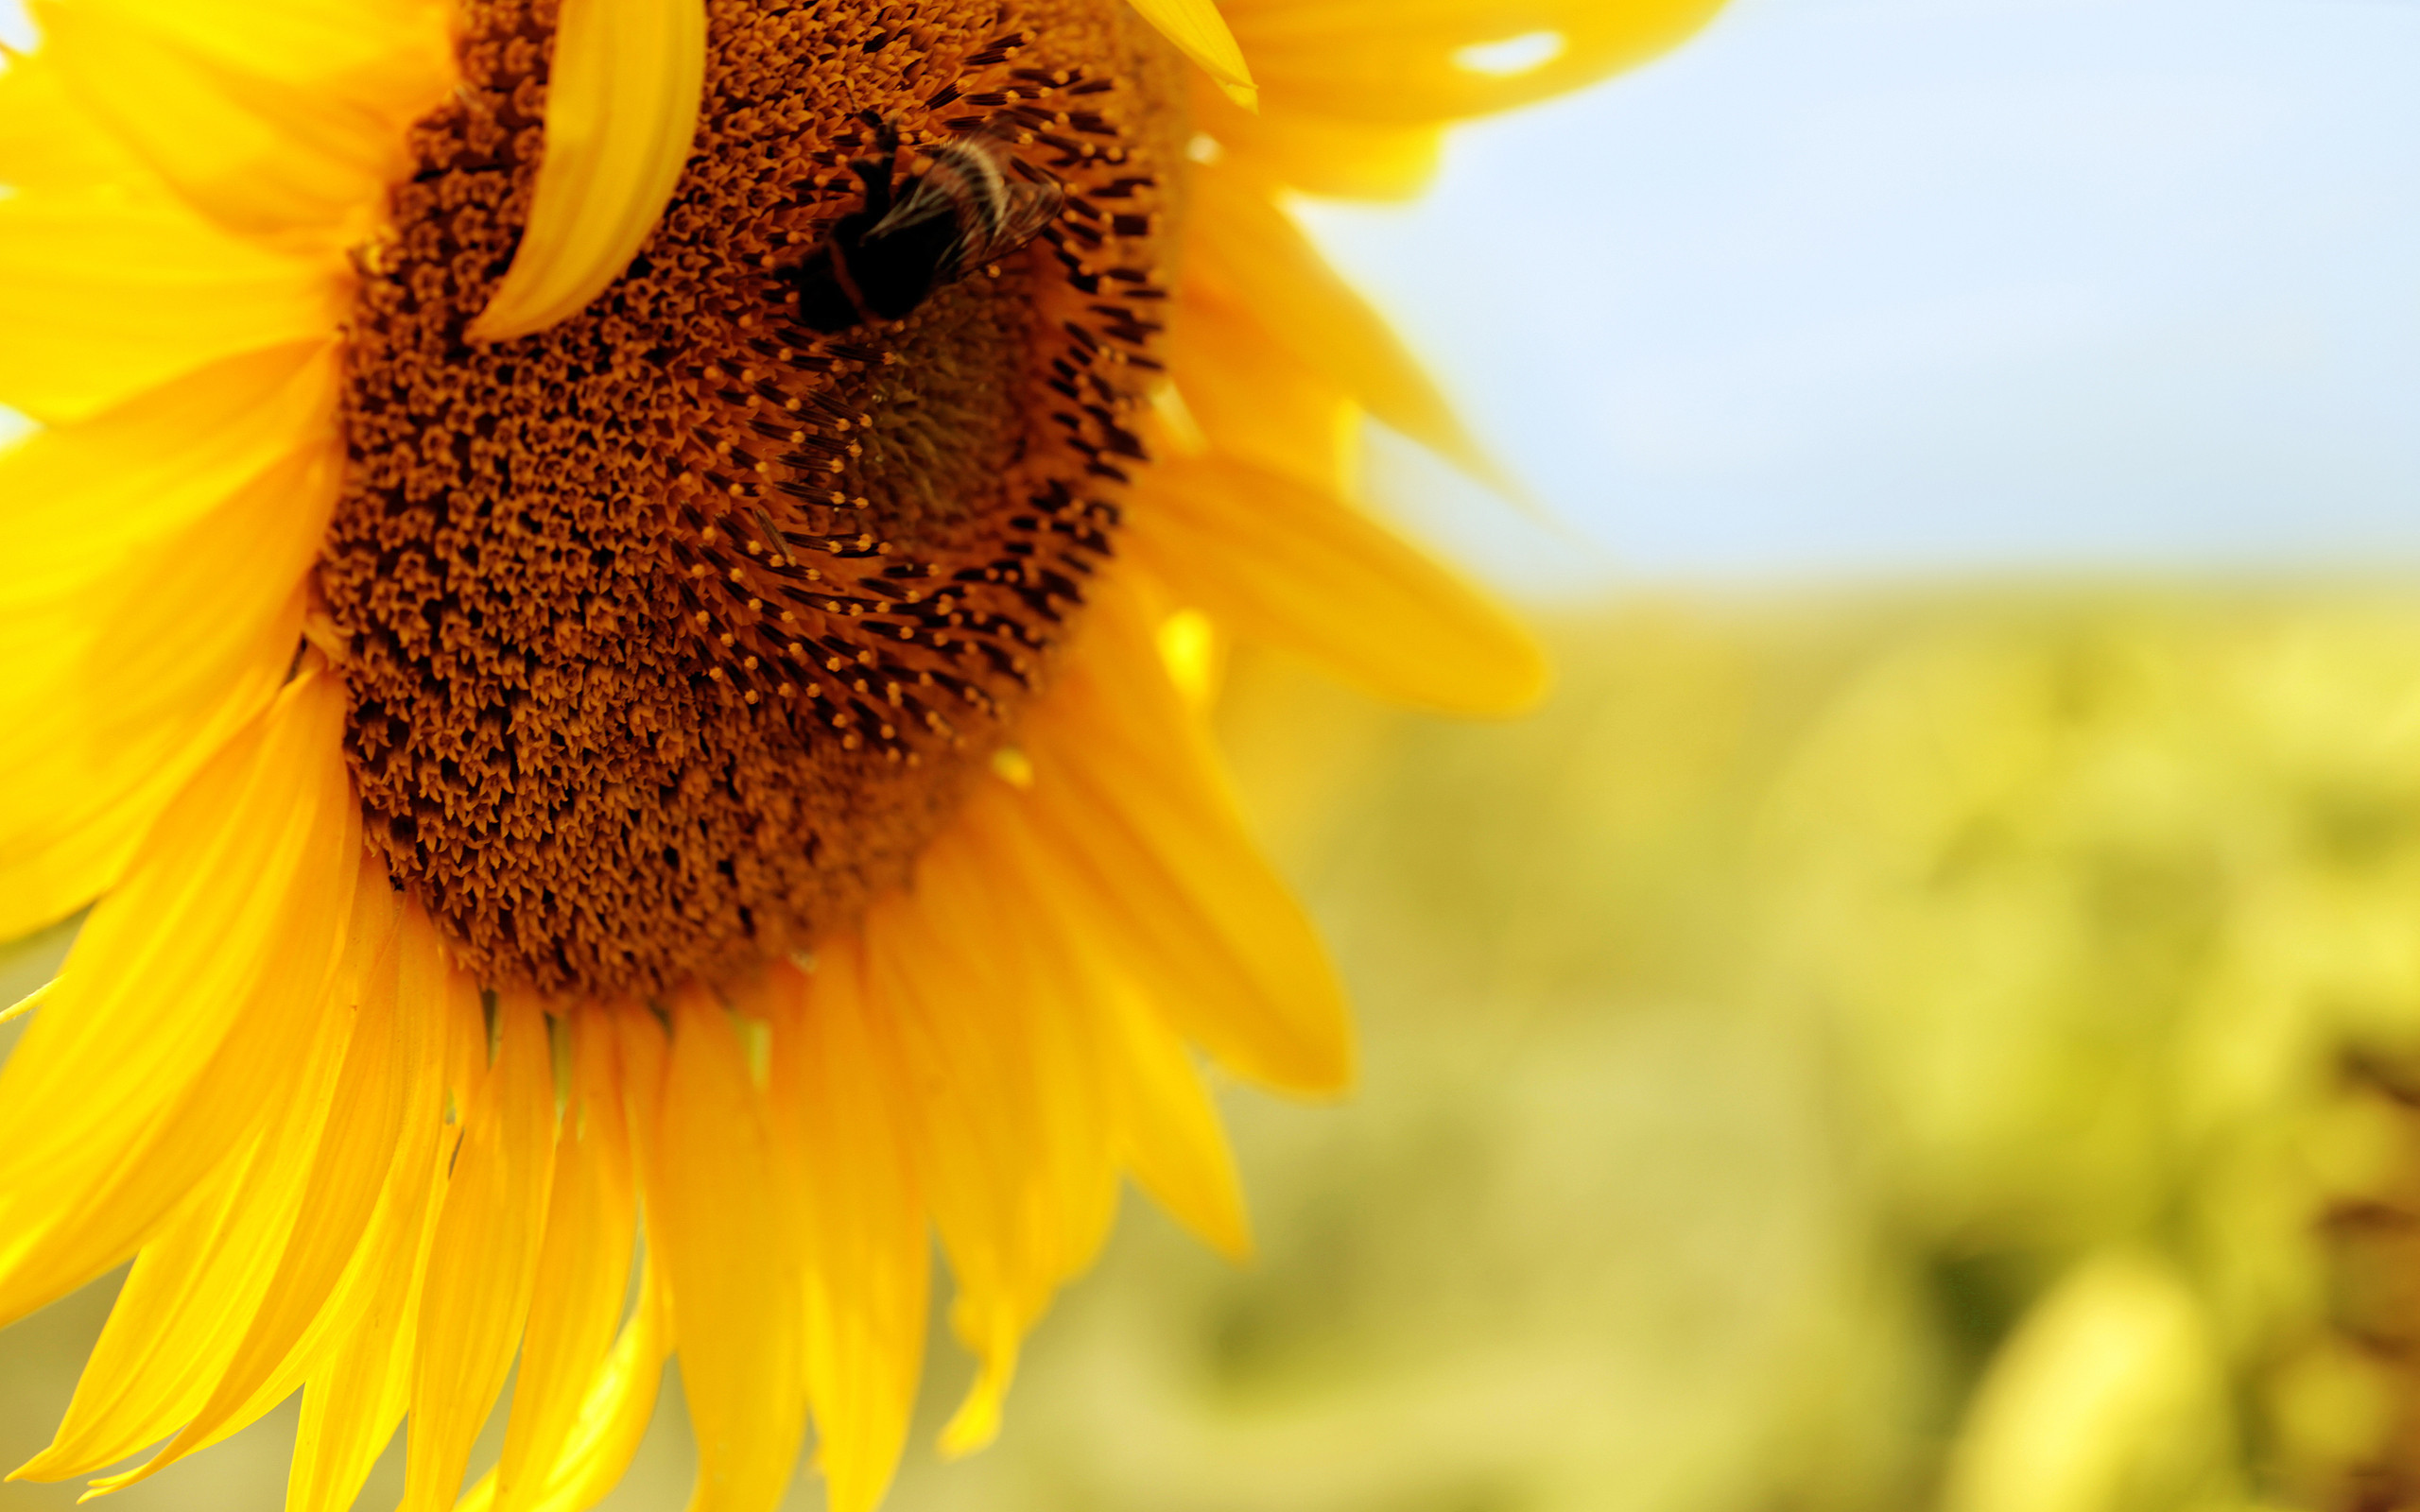 Sunflower Iphone Wallpaper Sunflower Full Hd Wallpaper And Background Image